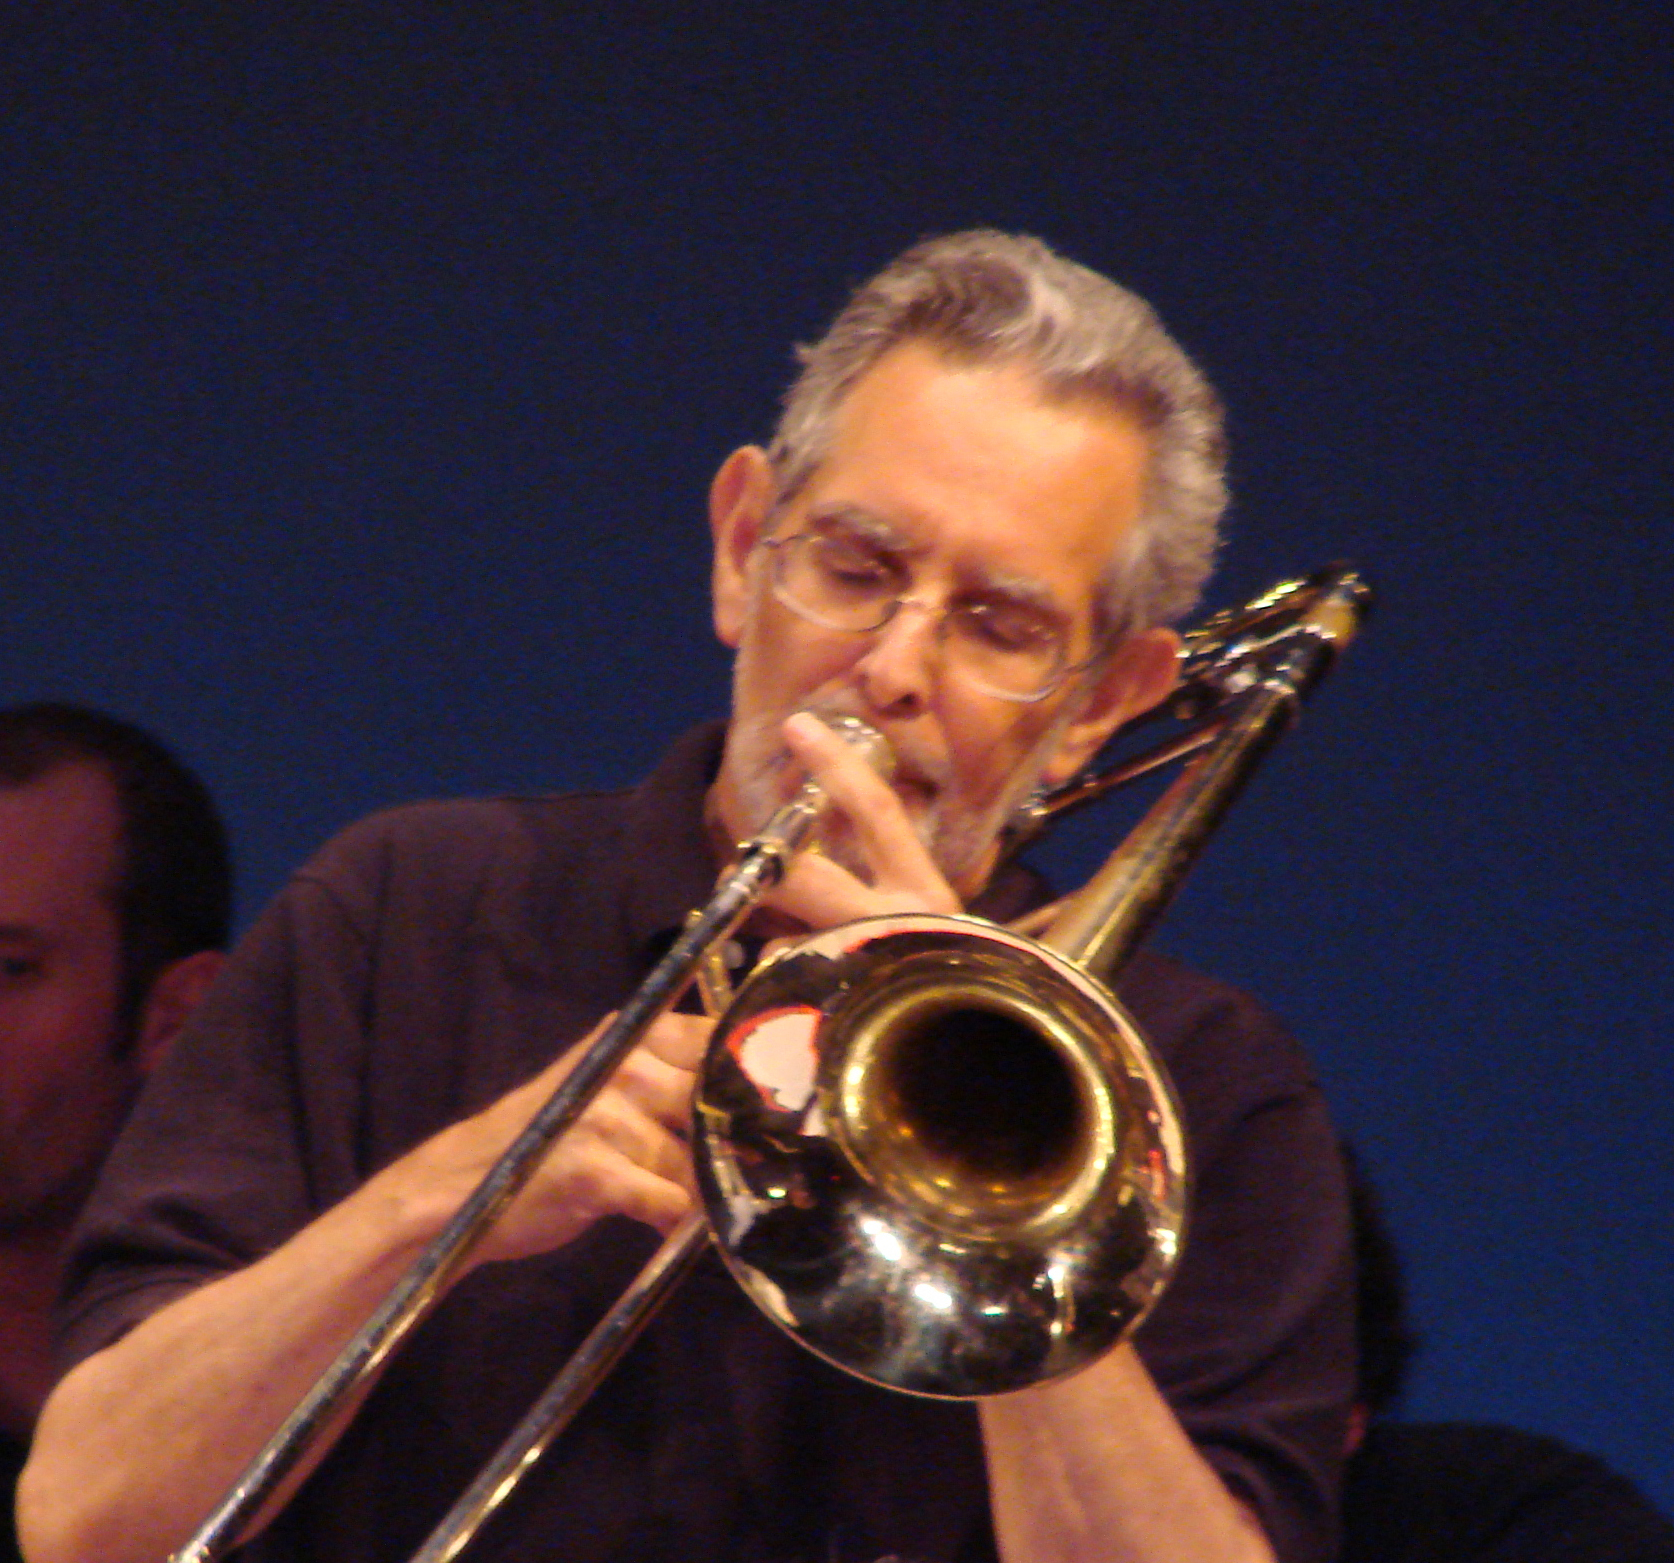 Peter Reichlin